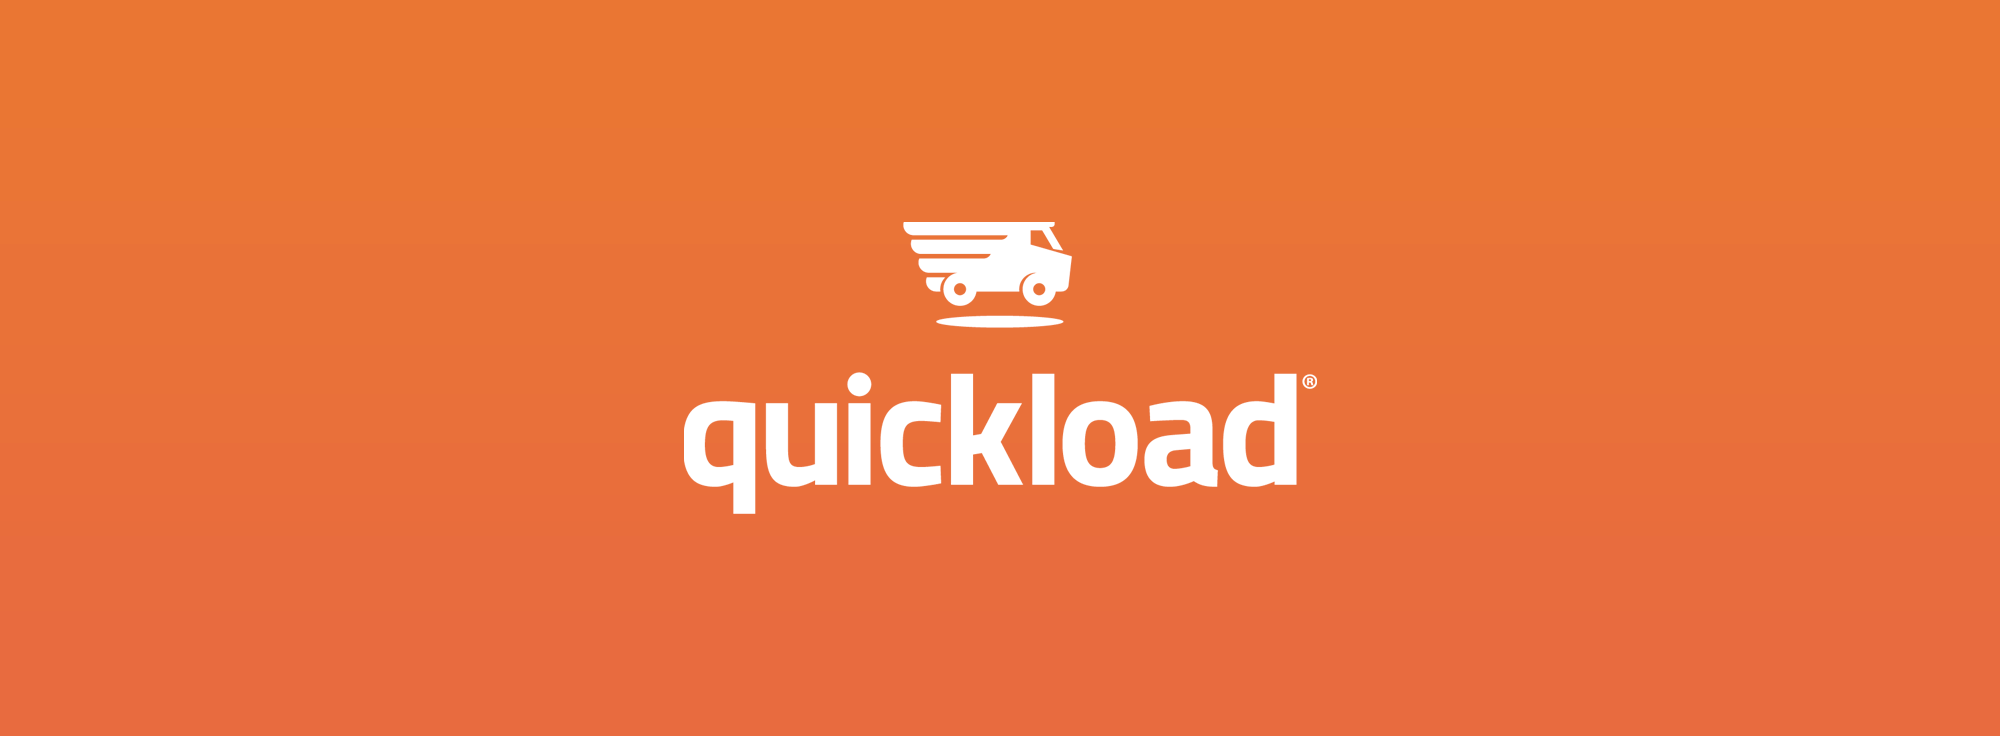 quickload featured image